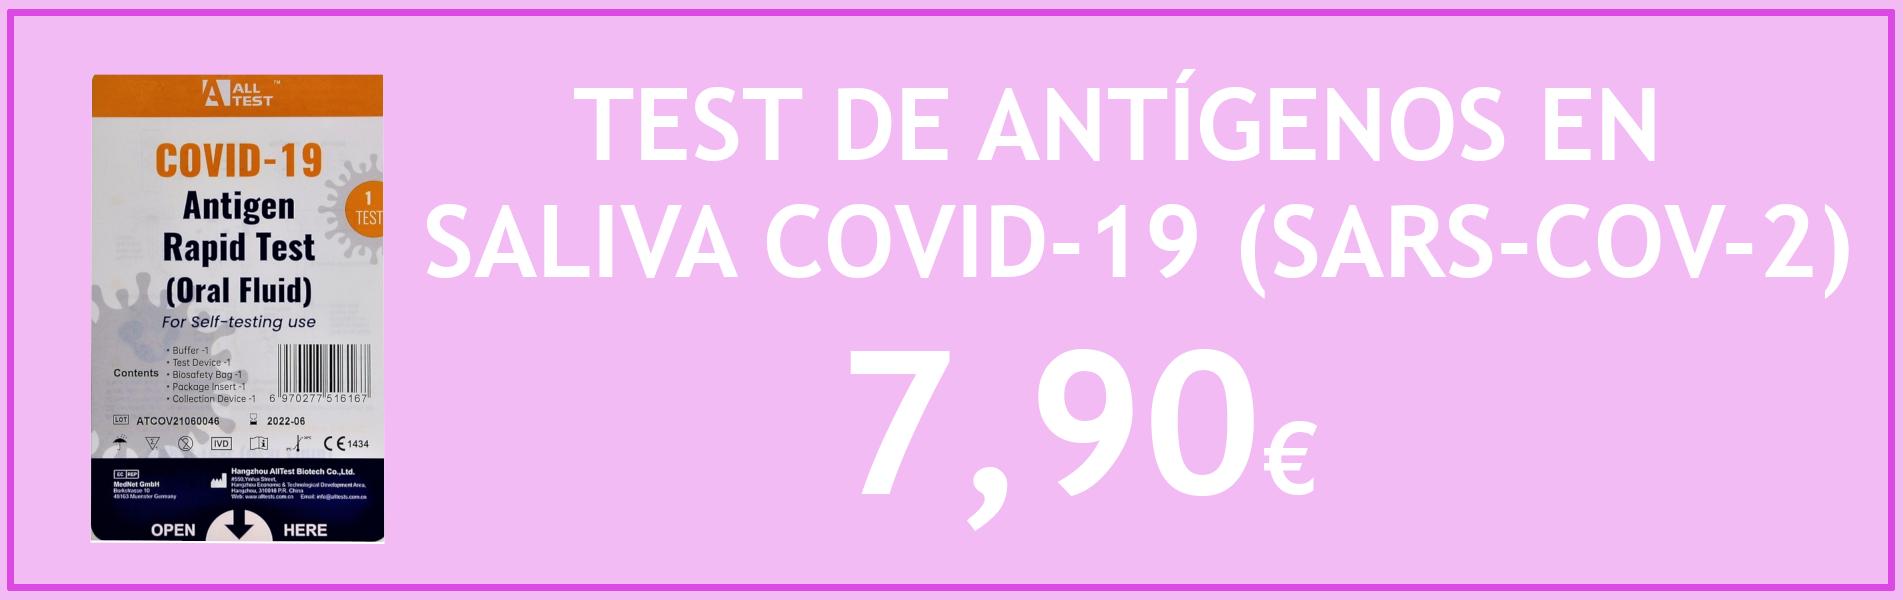 Test Antígenos COVID-19 SALIVA